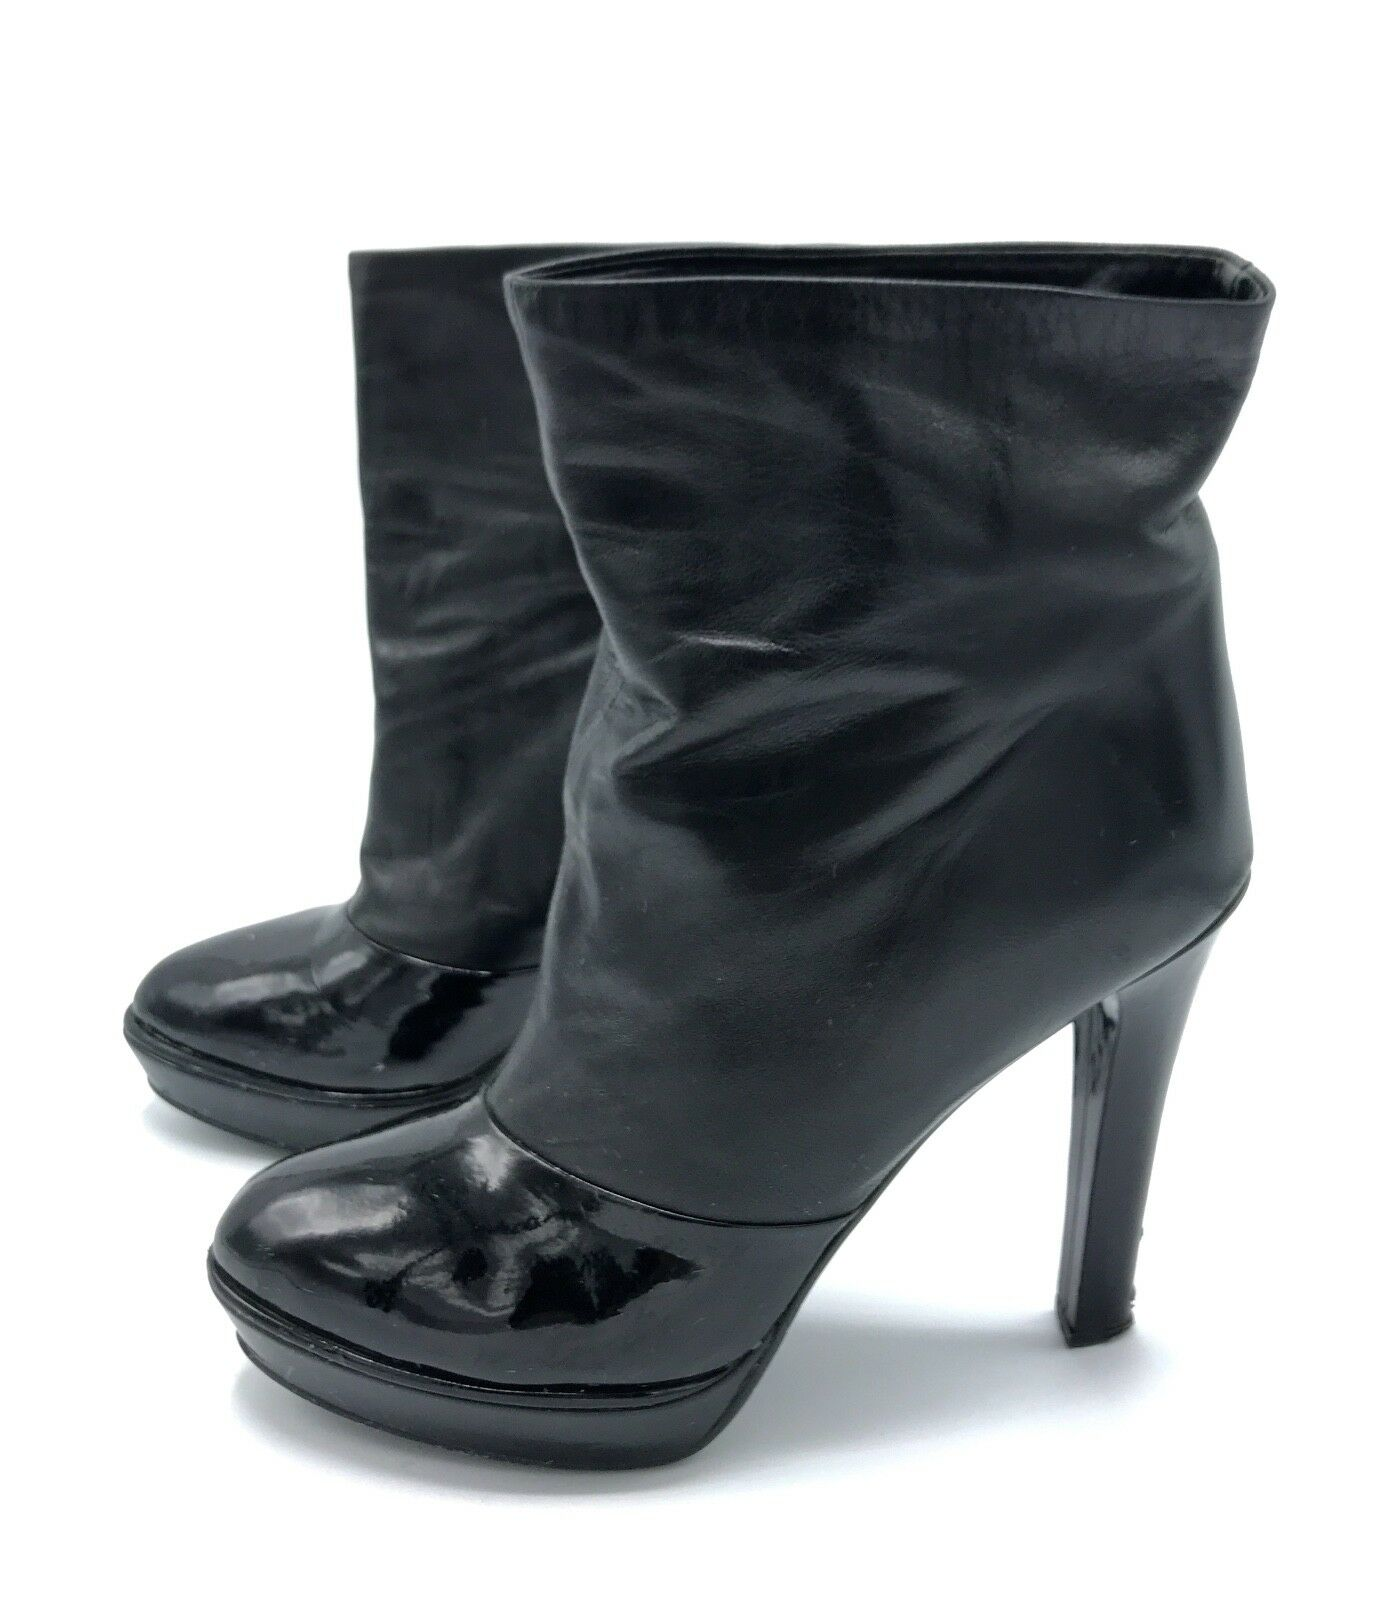 Carlo Pazolini Women's High Heels Platform Patent Leather Ankle Boots US10 EU40